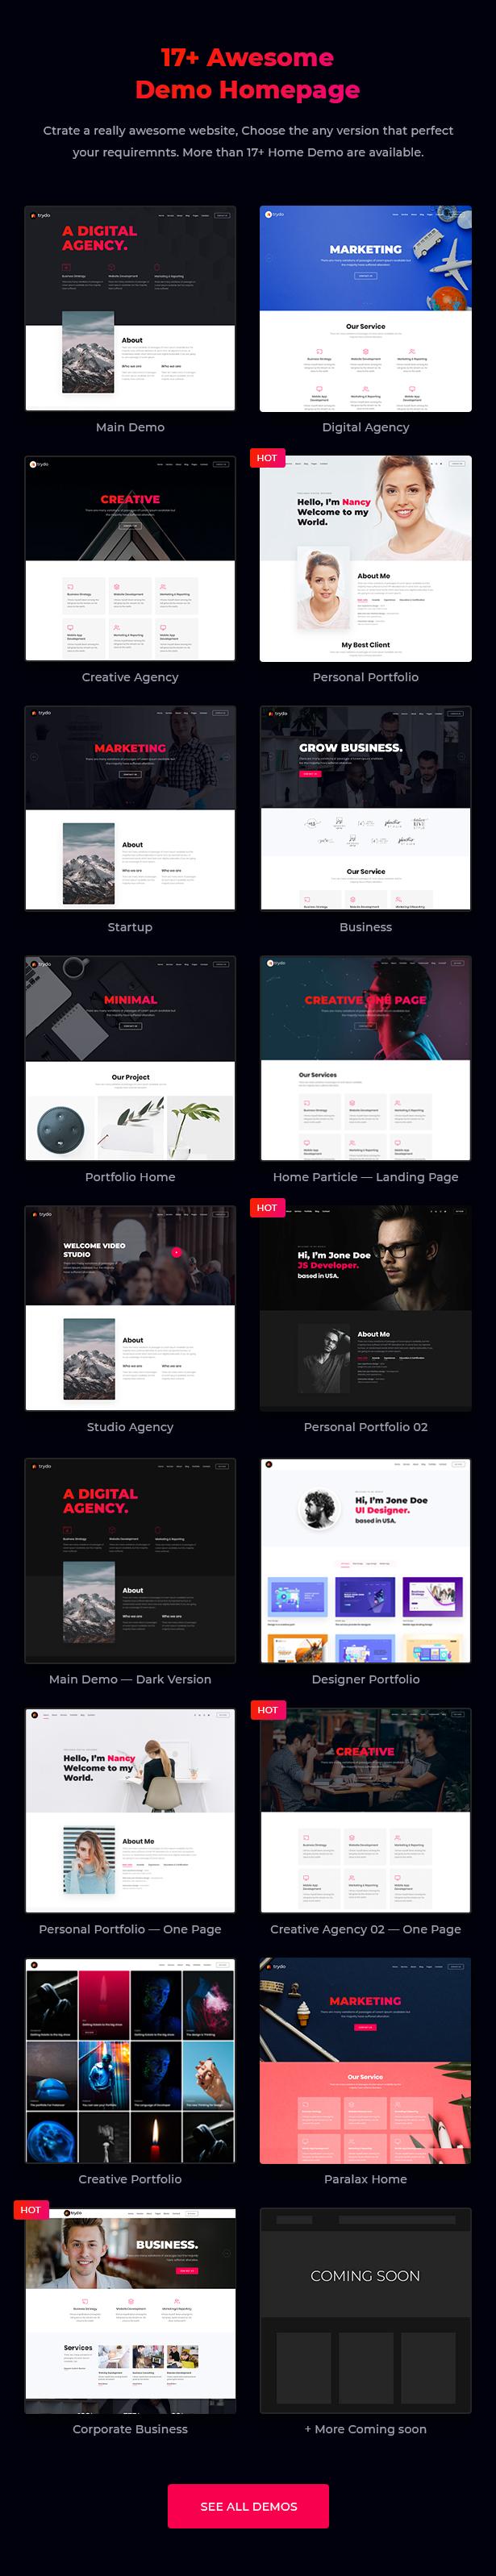 Trydo - Creative Agency & Portfolio Theme - 7